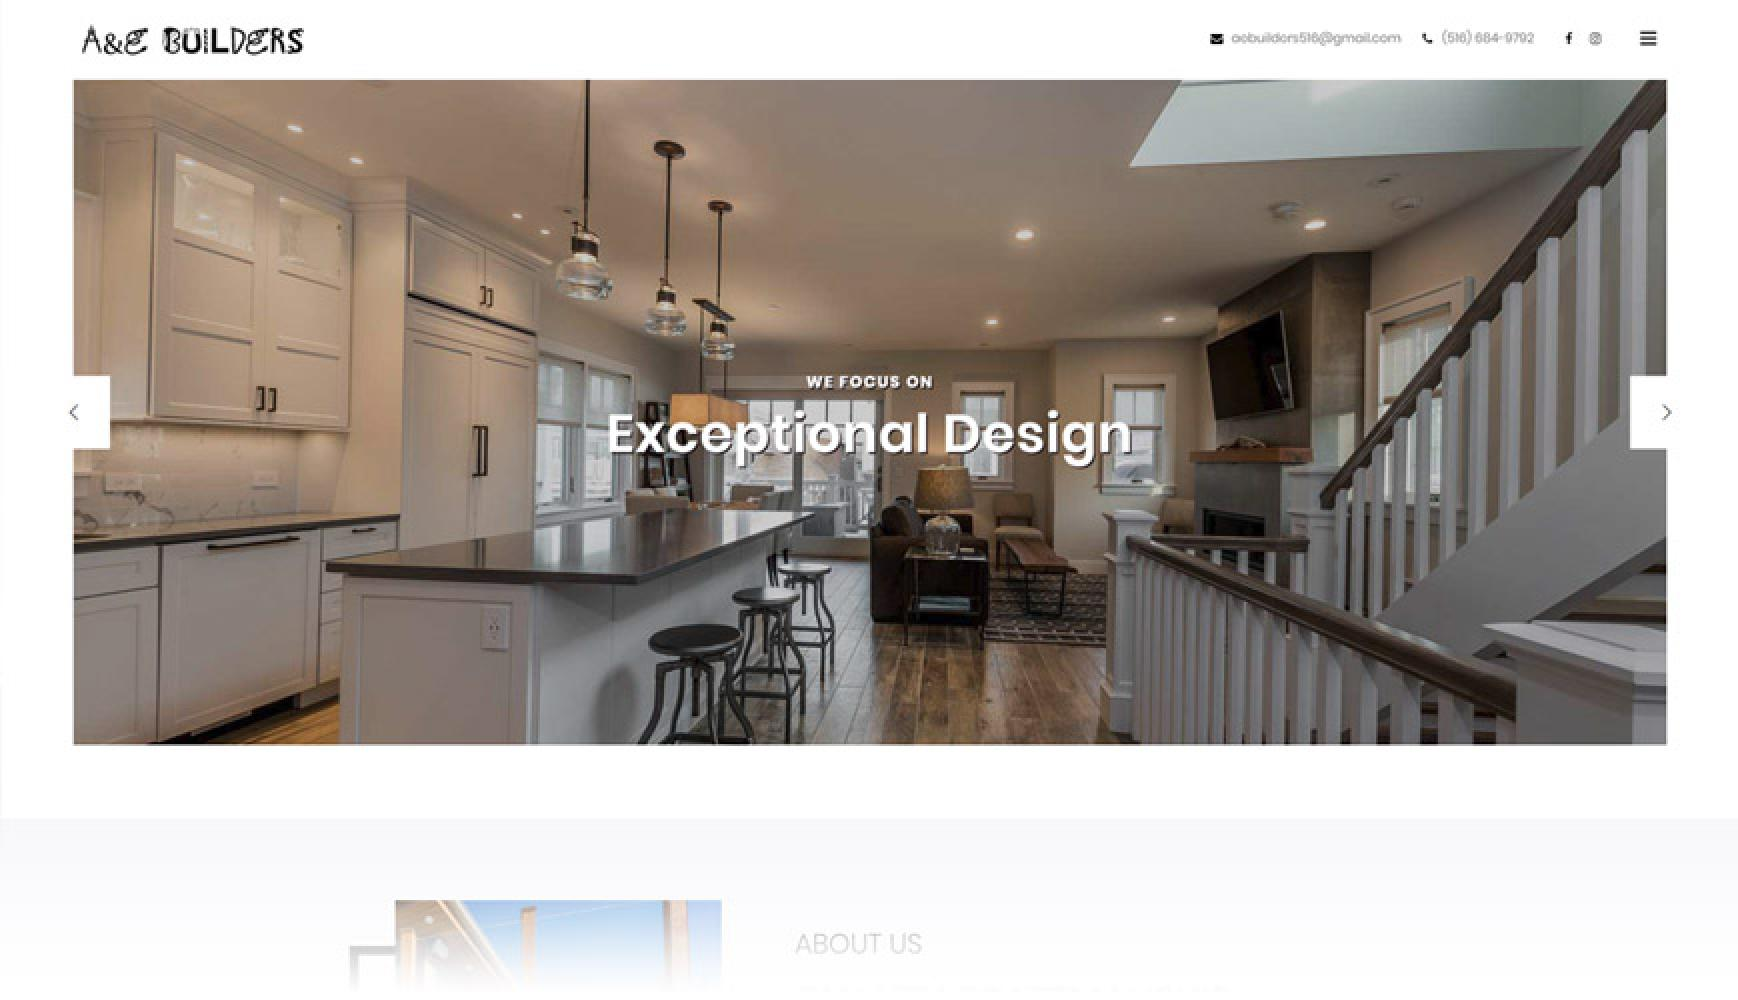 A&E Builders New Web Site